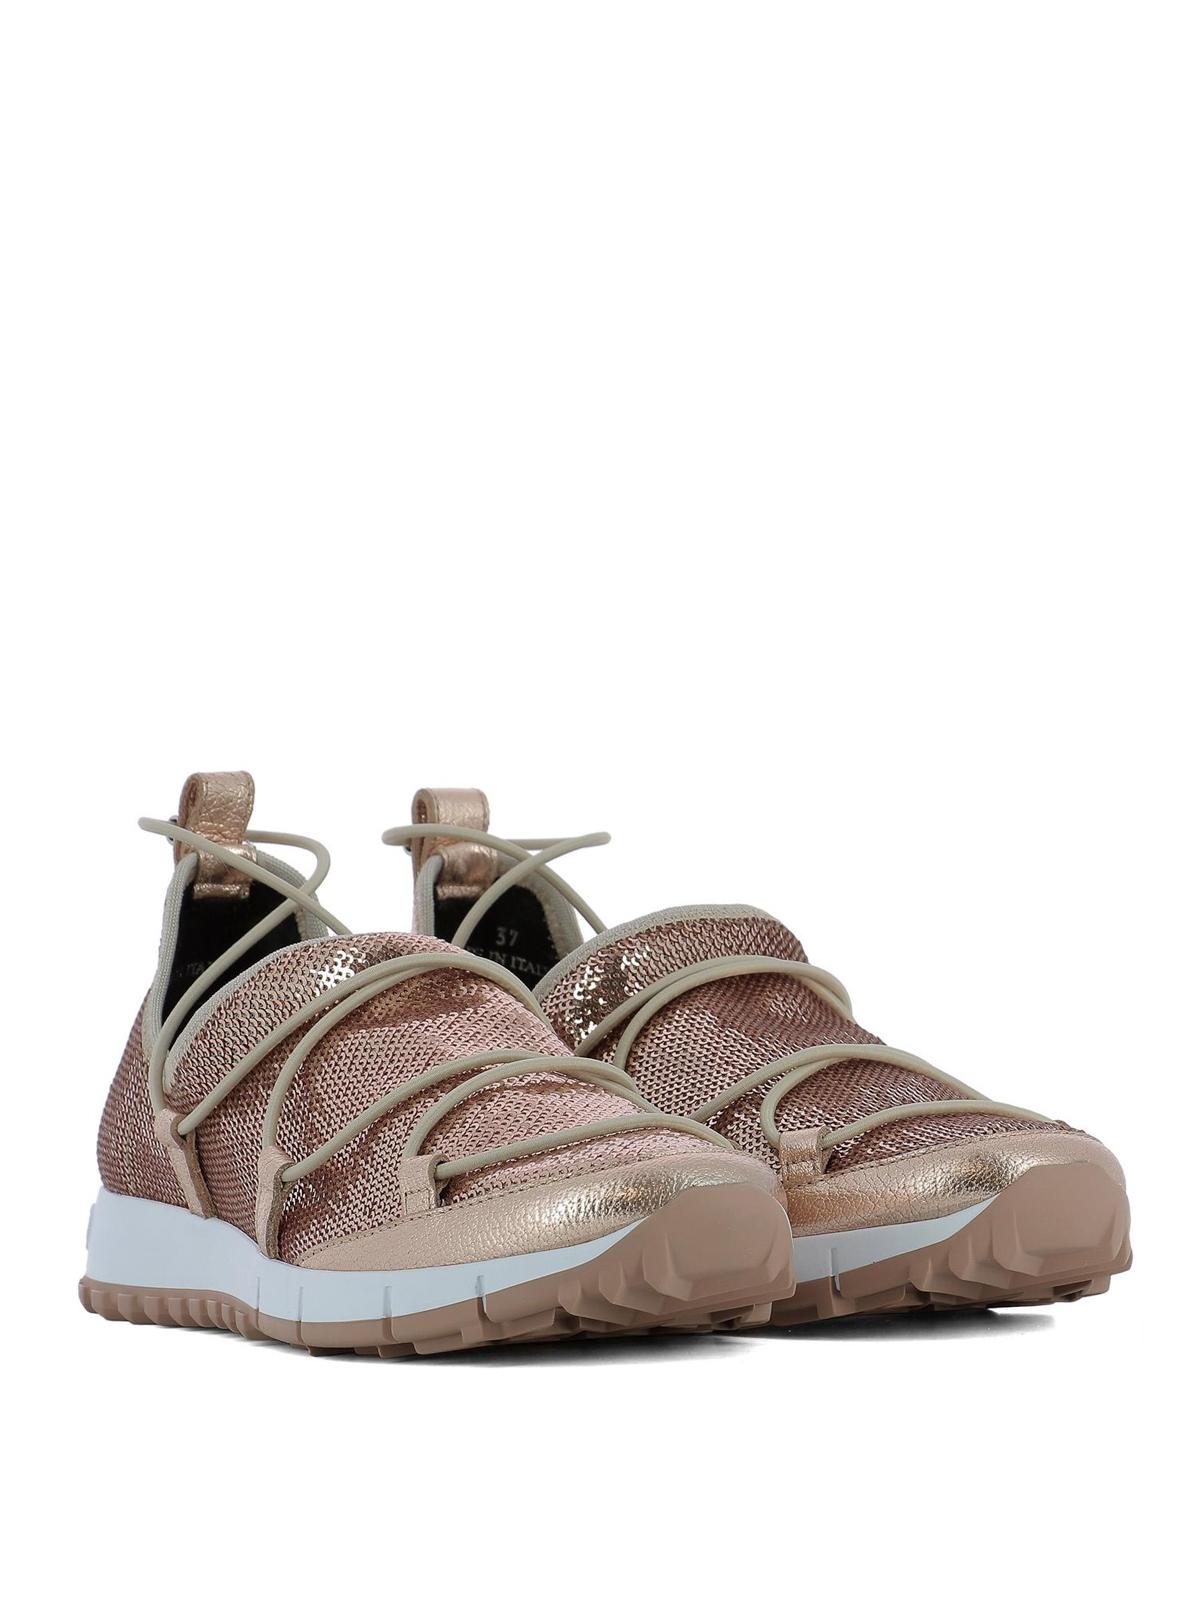 Jimmy Choo - Andrea sequin sneakers